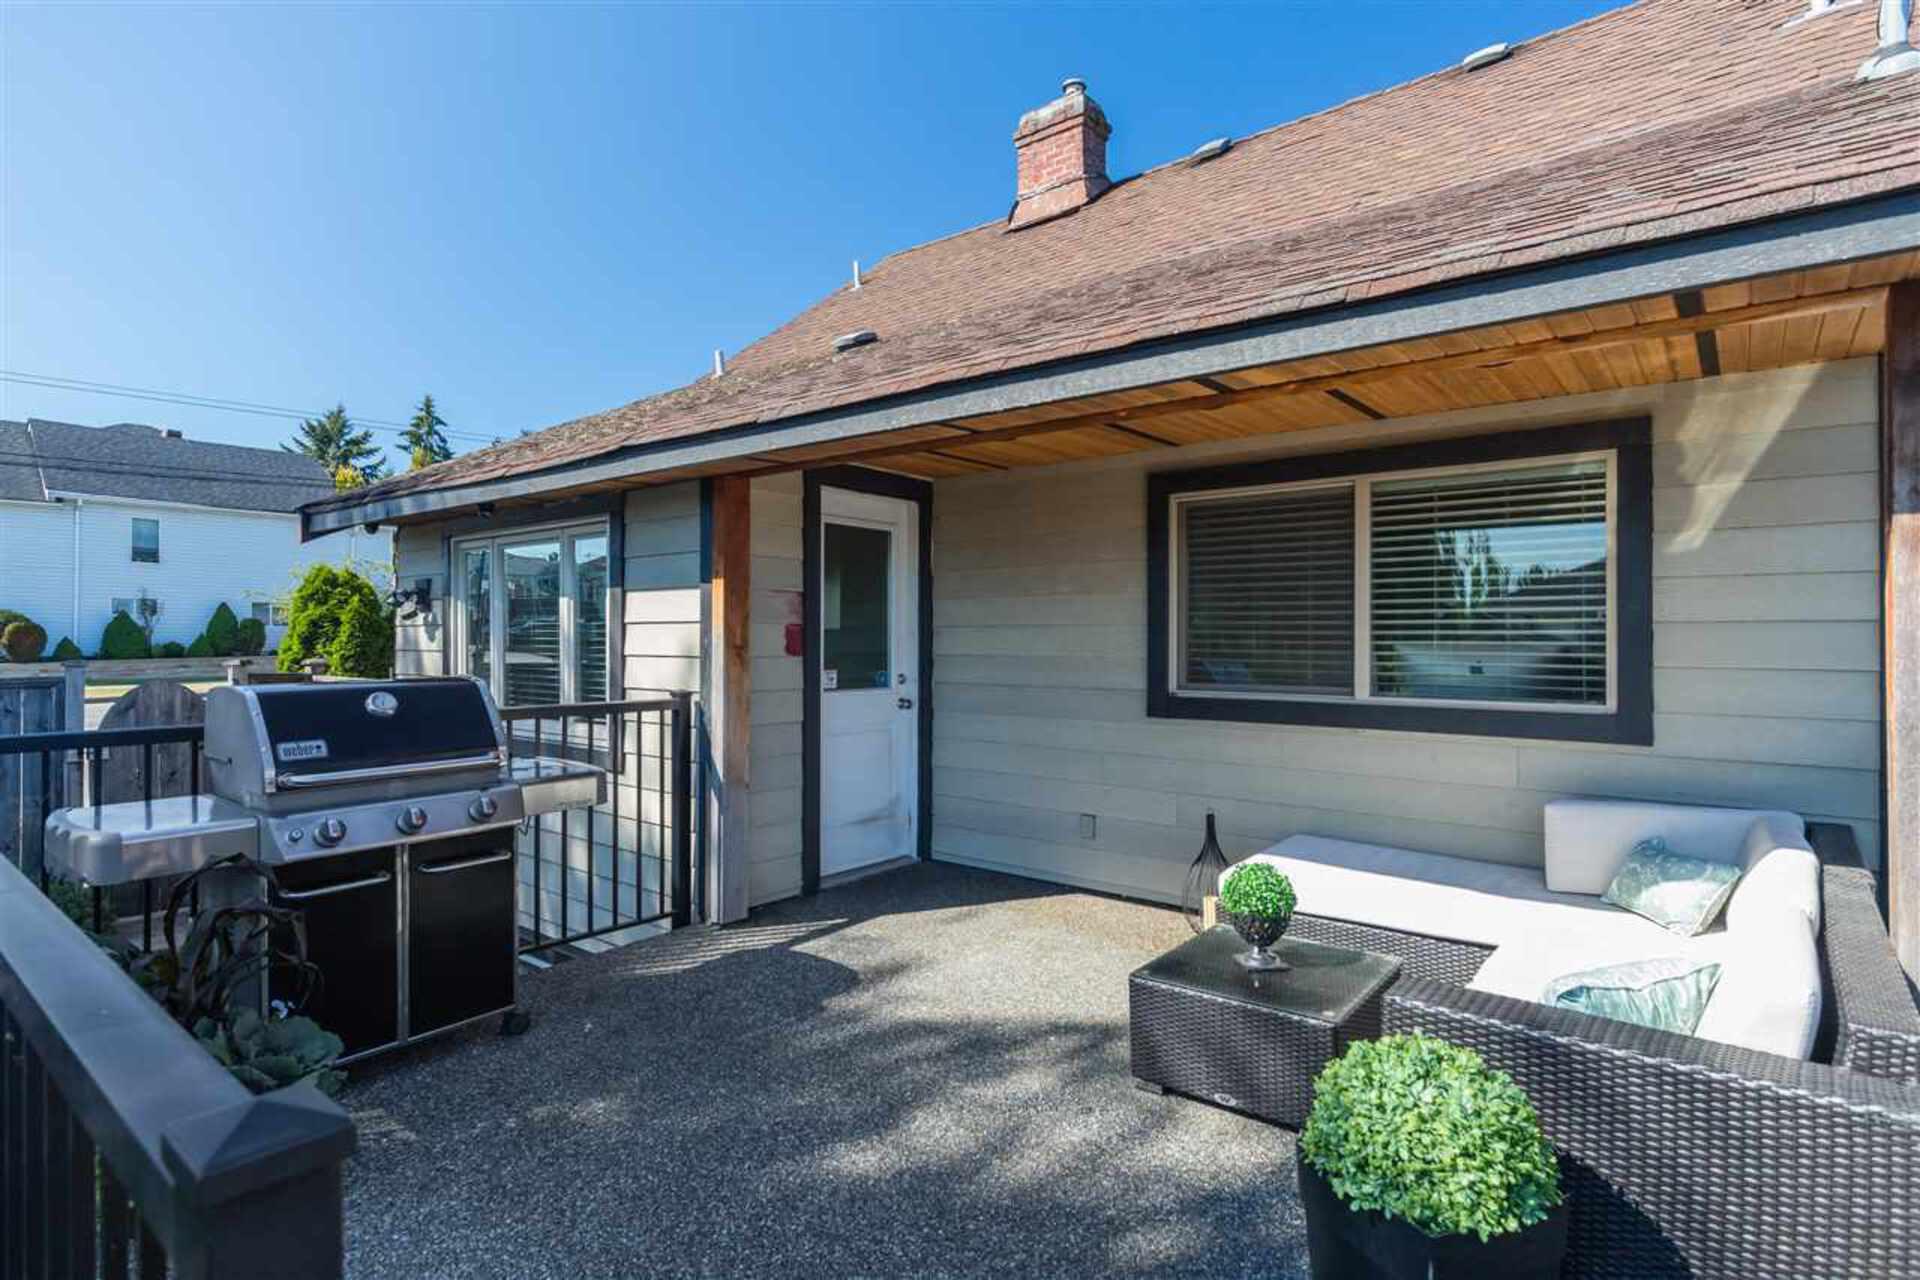 2904-turner-street-renfrew-ve-vancouver-east-22 at 2904 Turner Street, Renfrew VE, Vancouver East